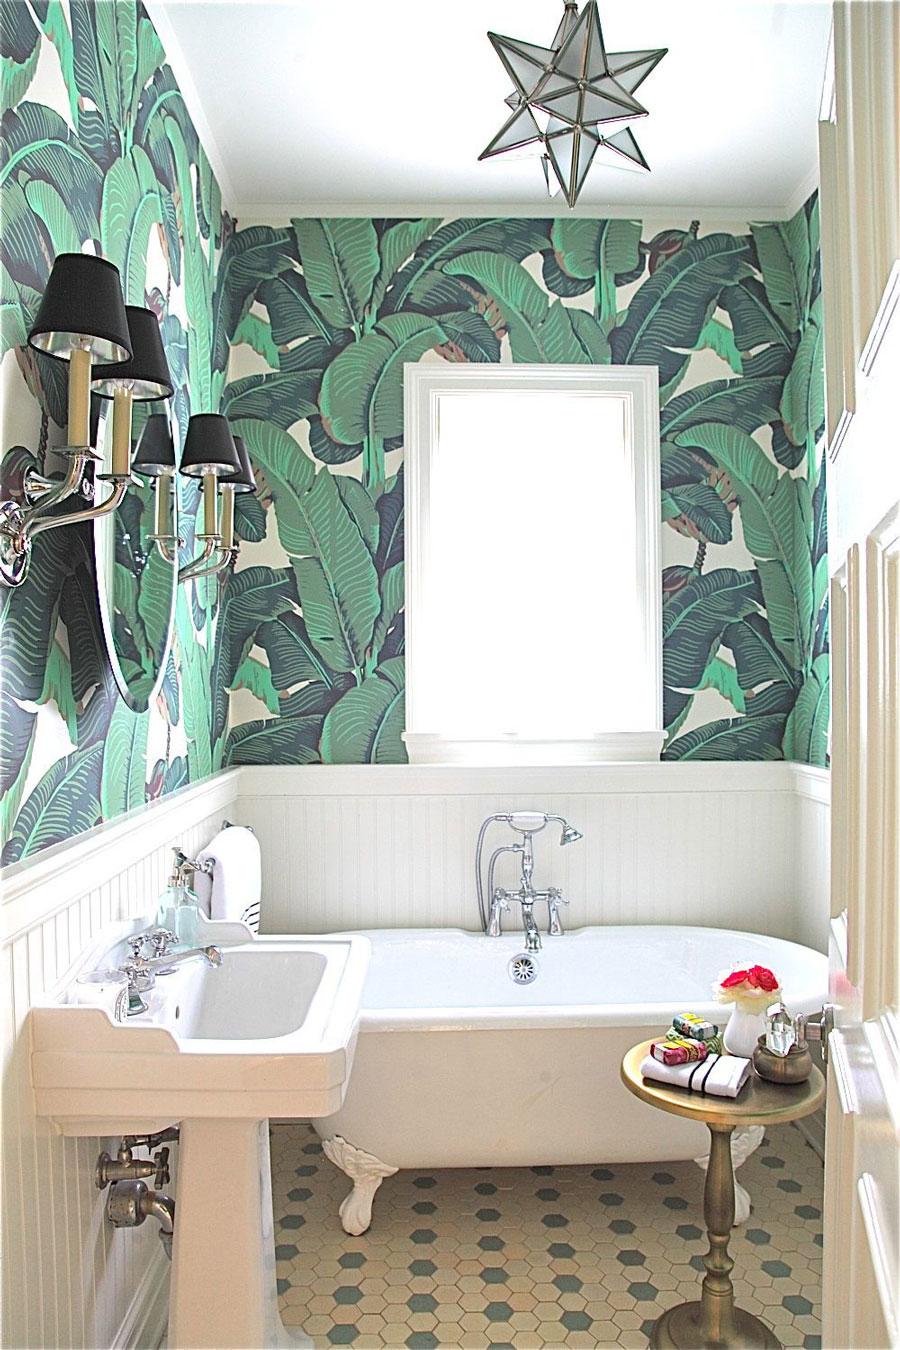 razones atreverse papel mural baño